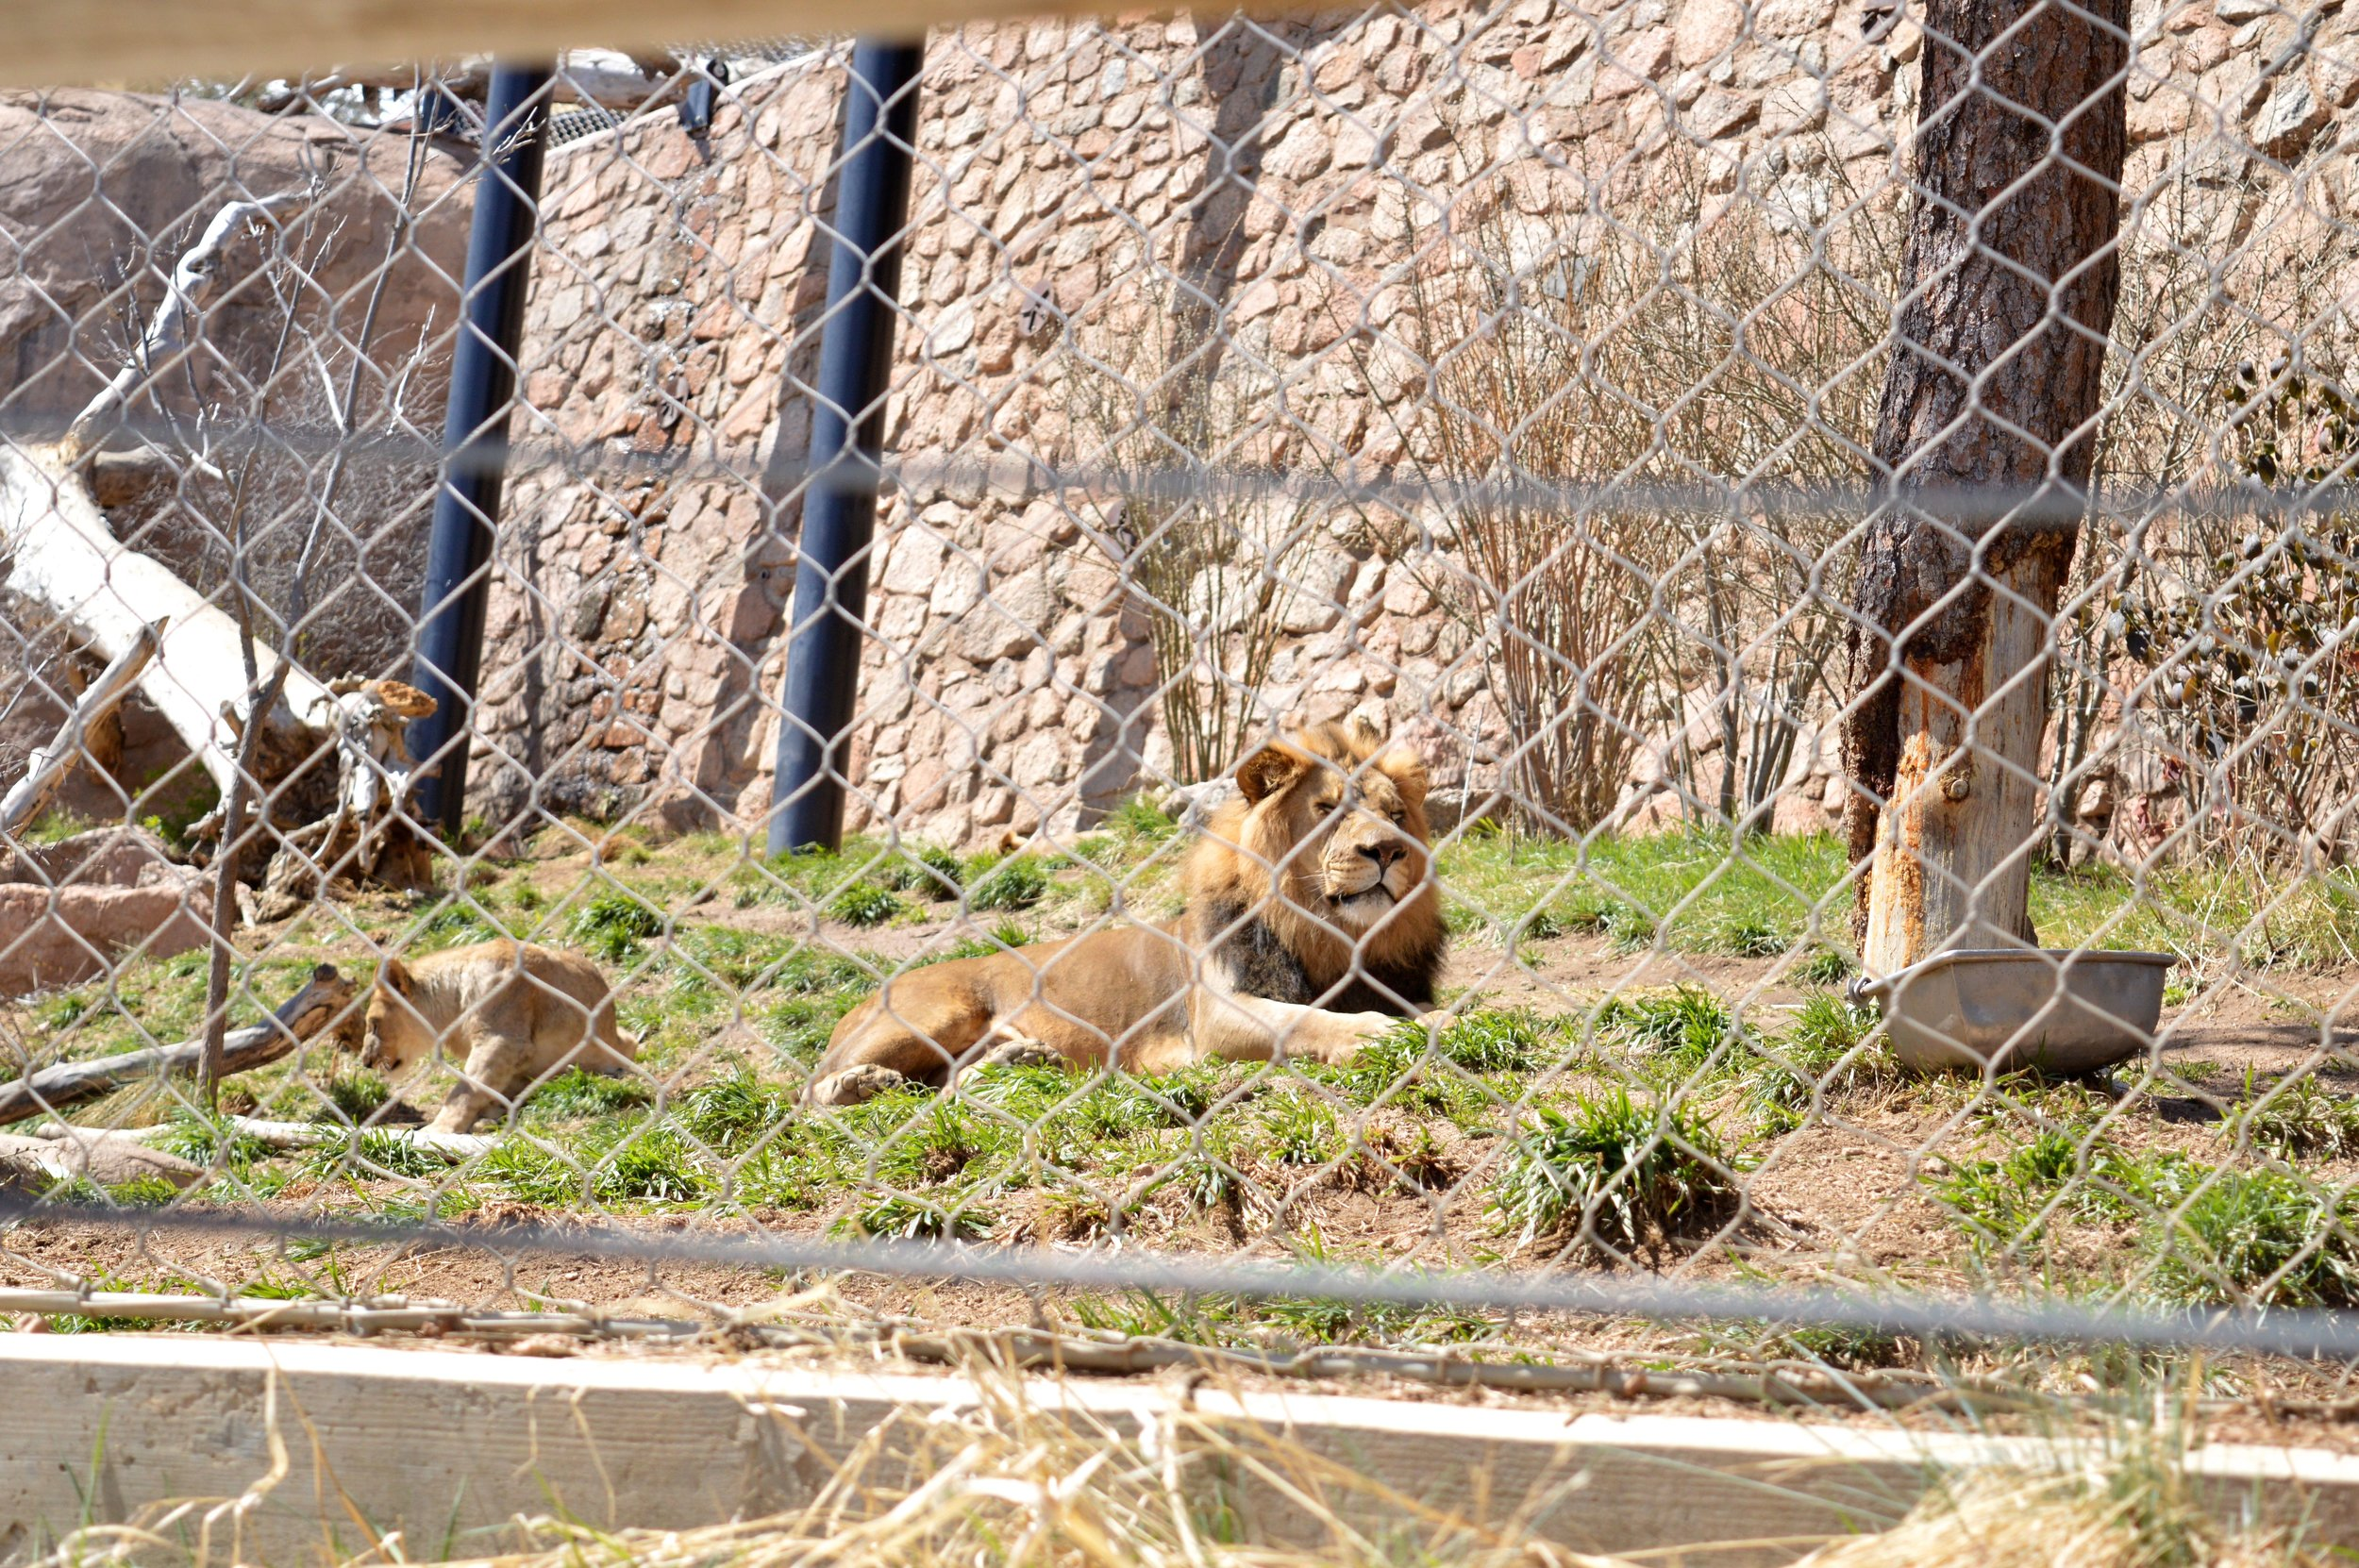 cheyenne-mountain-zoo-lion.jpg